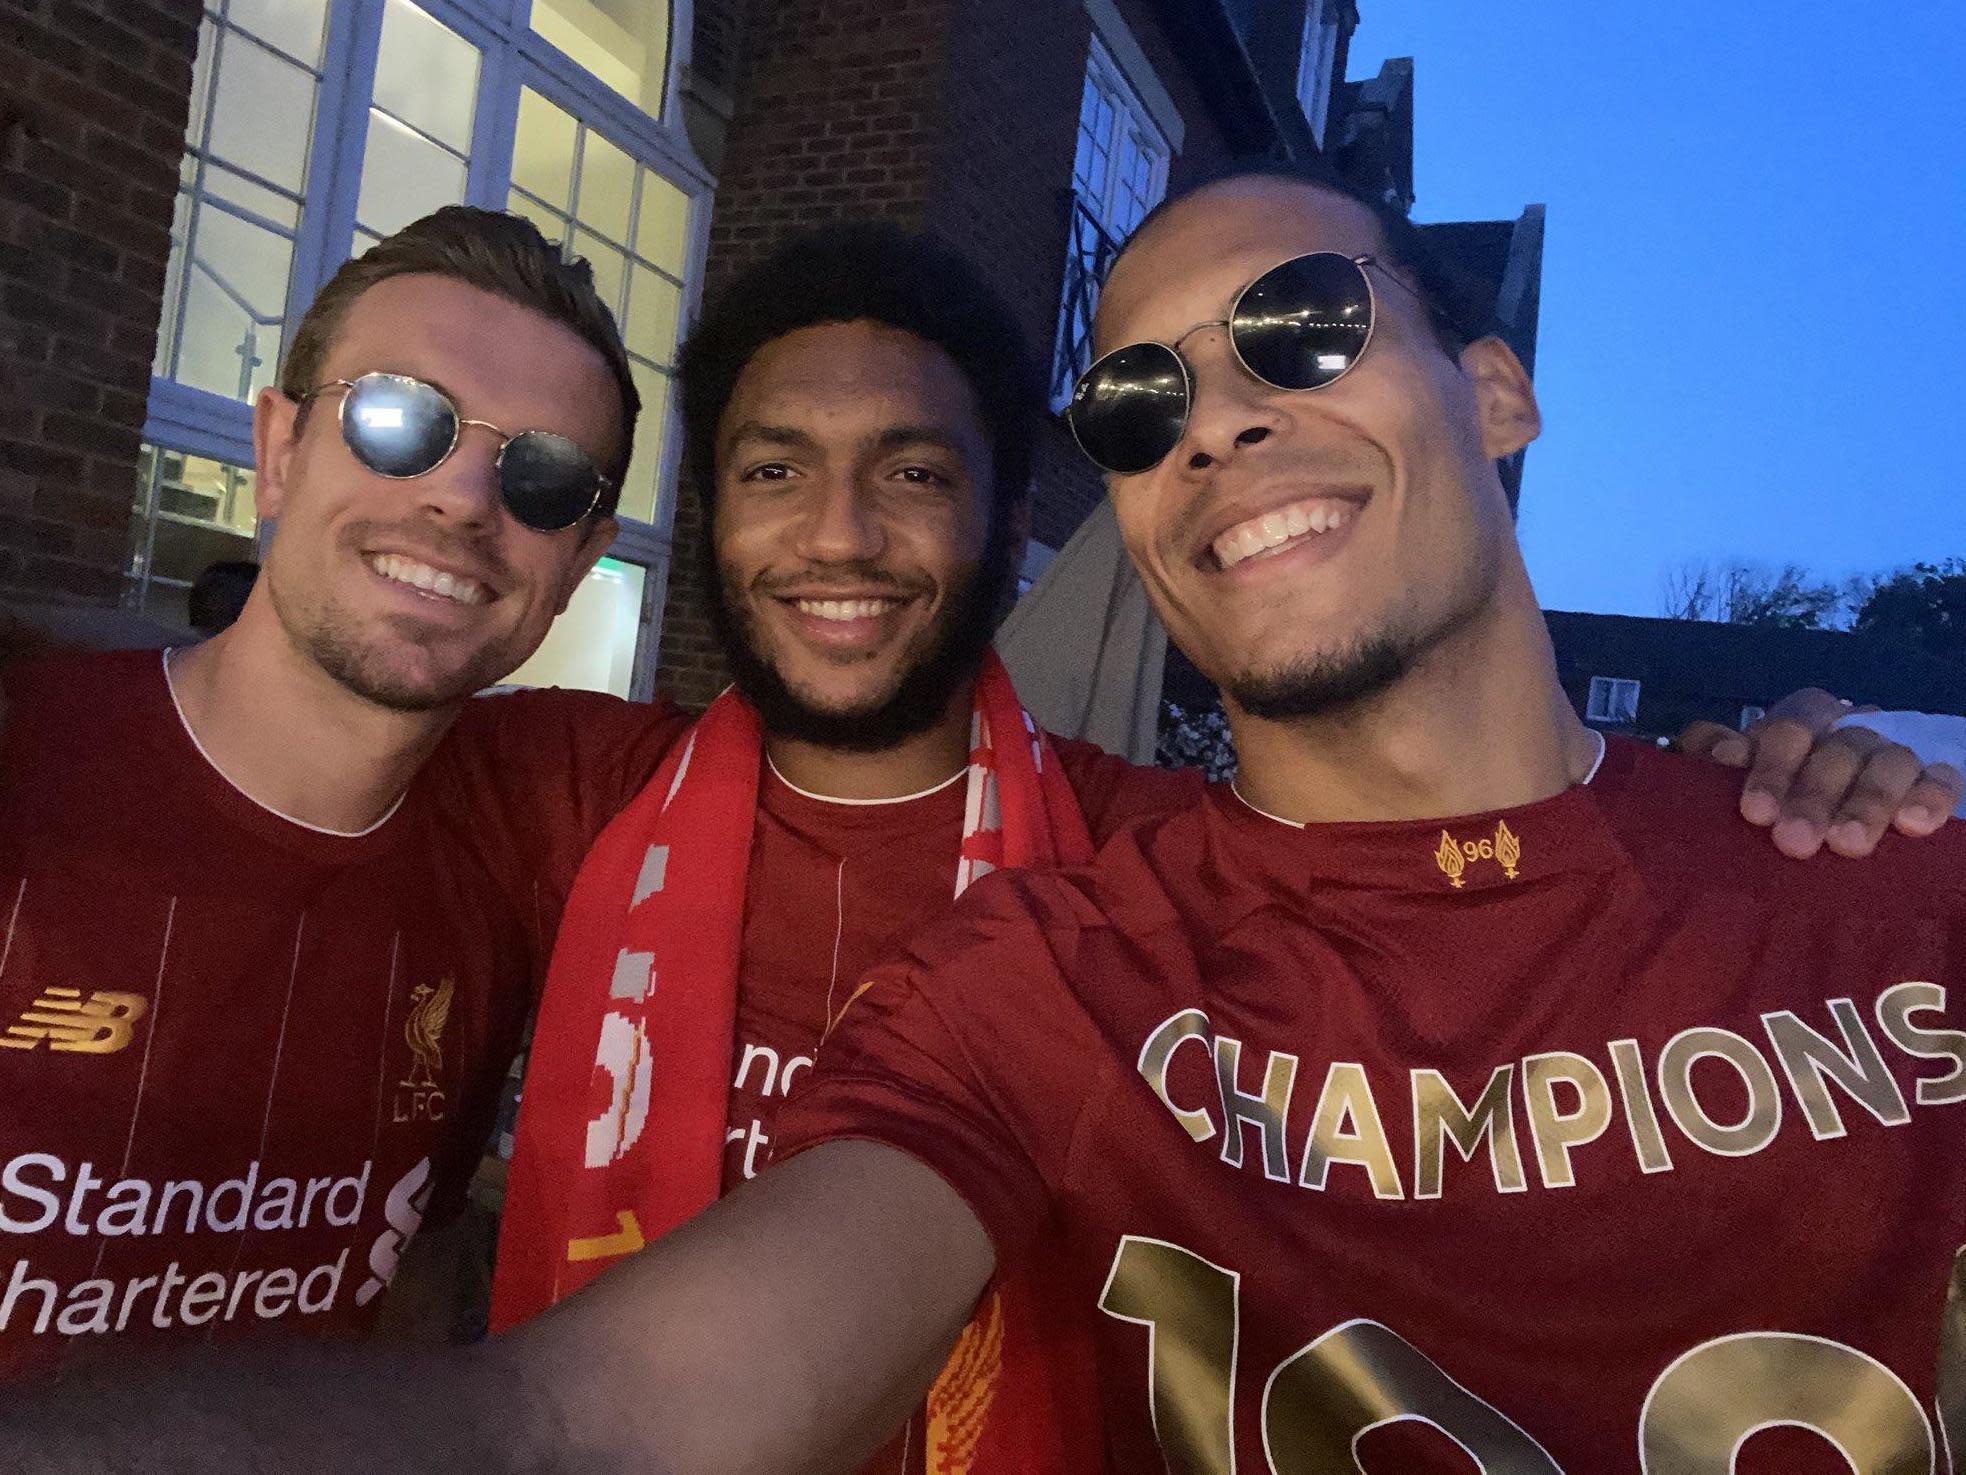 Игроки Ливерпуля празднуют чемпионство АПЛ